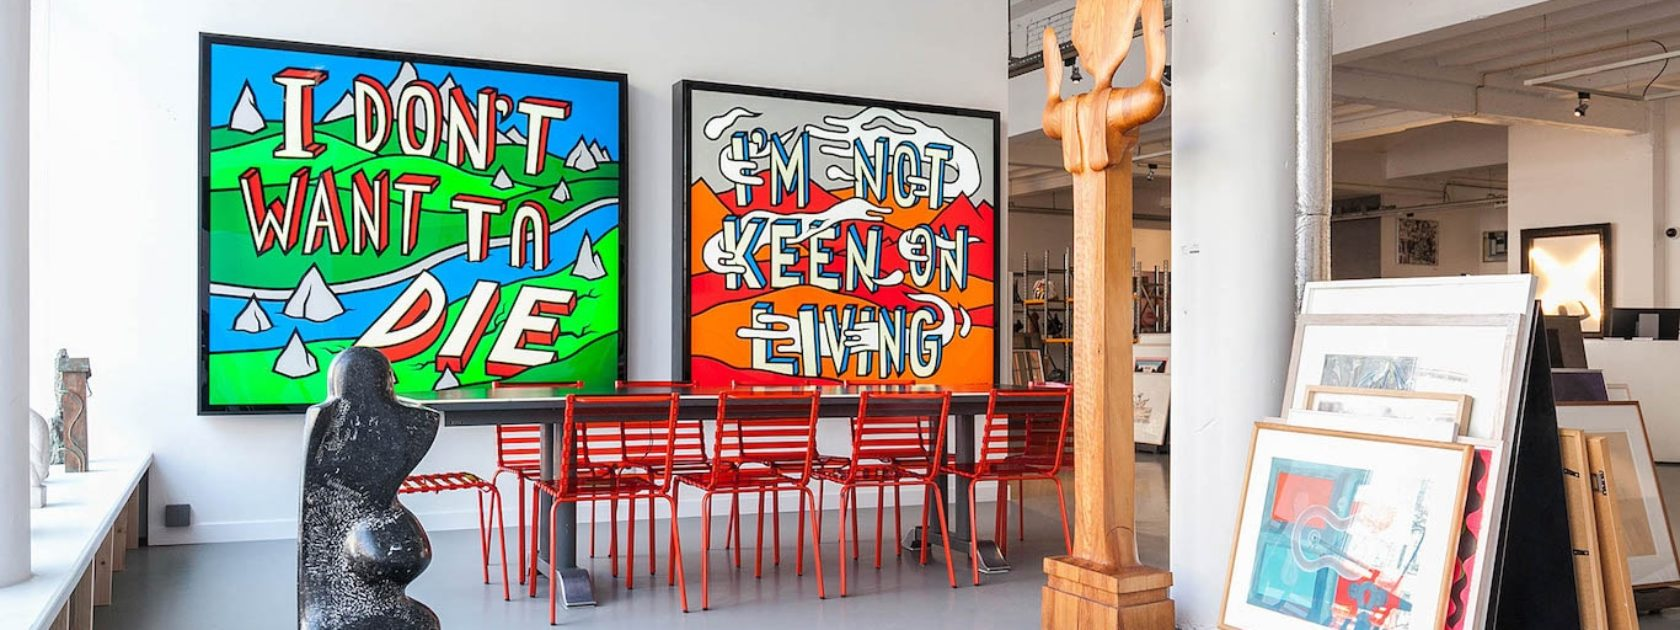 Kunstuitleen in Rotterdam, Kunst in Rotterdam, Art in Rotterdam, betaalbare kunst in Rotterdam, het ontstaan van de kunstuitleen in Rotterdam, wat is de kunstuitleen in Rotterdam, alles wat je moet weten van de kunstuitleen in Rotterdam, afforda